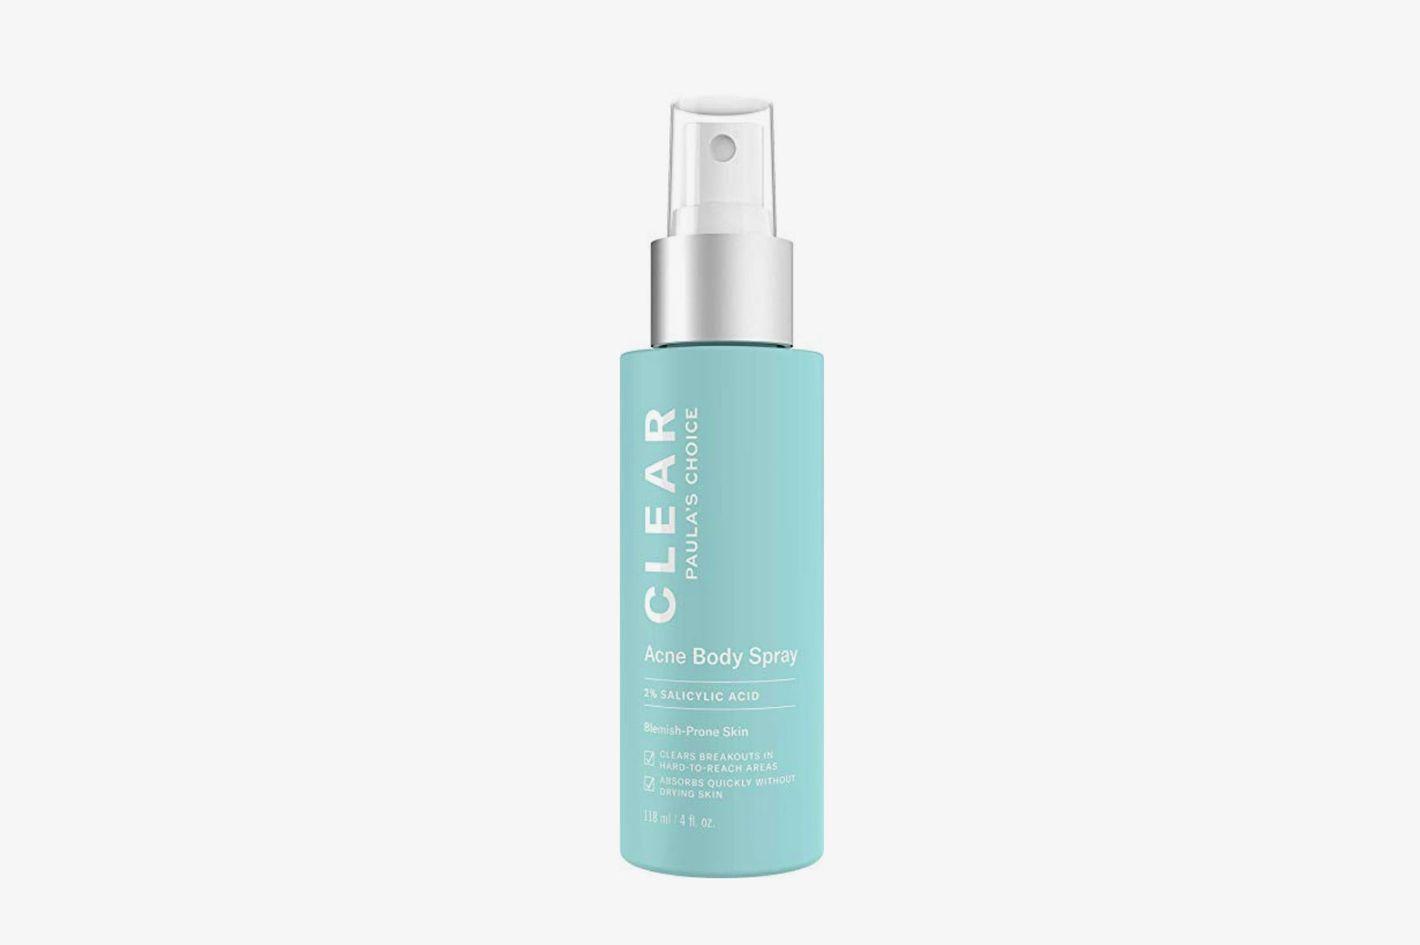 Paula's Choice-CLEAR Back and Body Acne Spray-w/2% Salicylic Acid-Leave-On Exfoliant